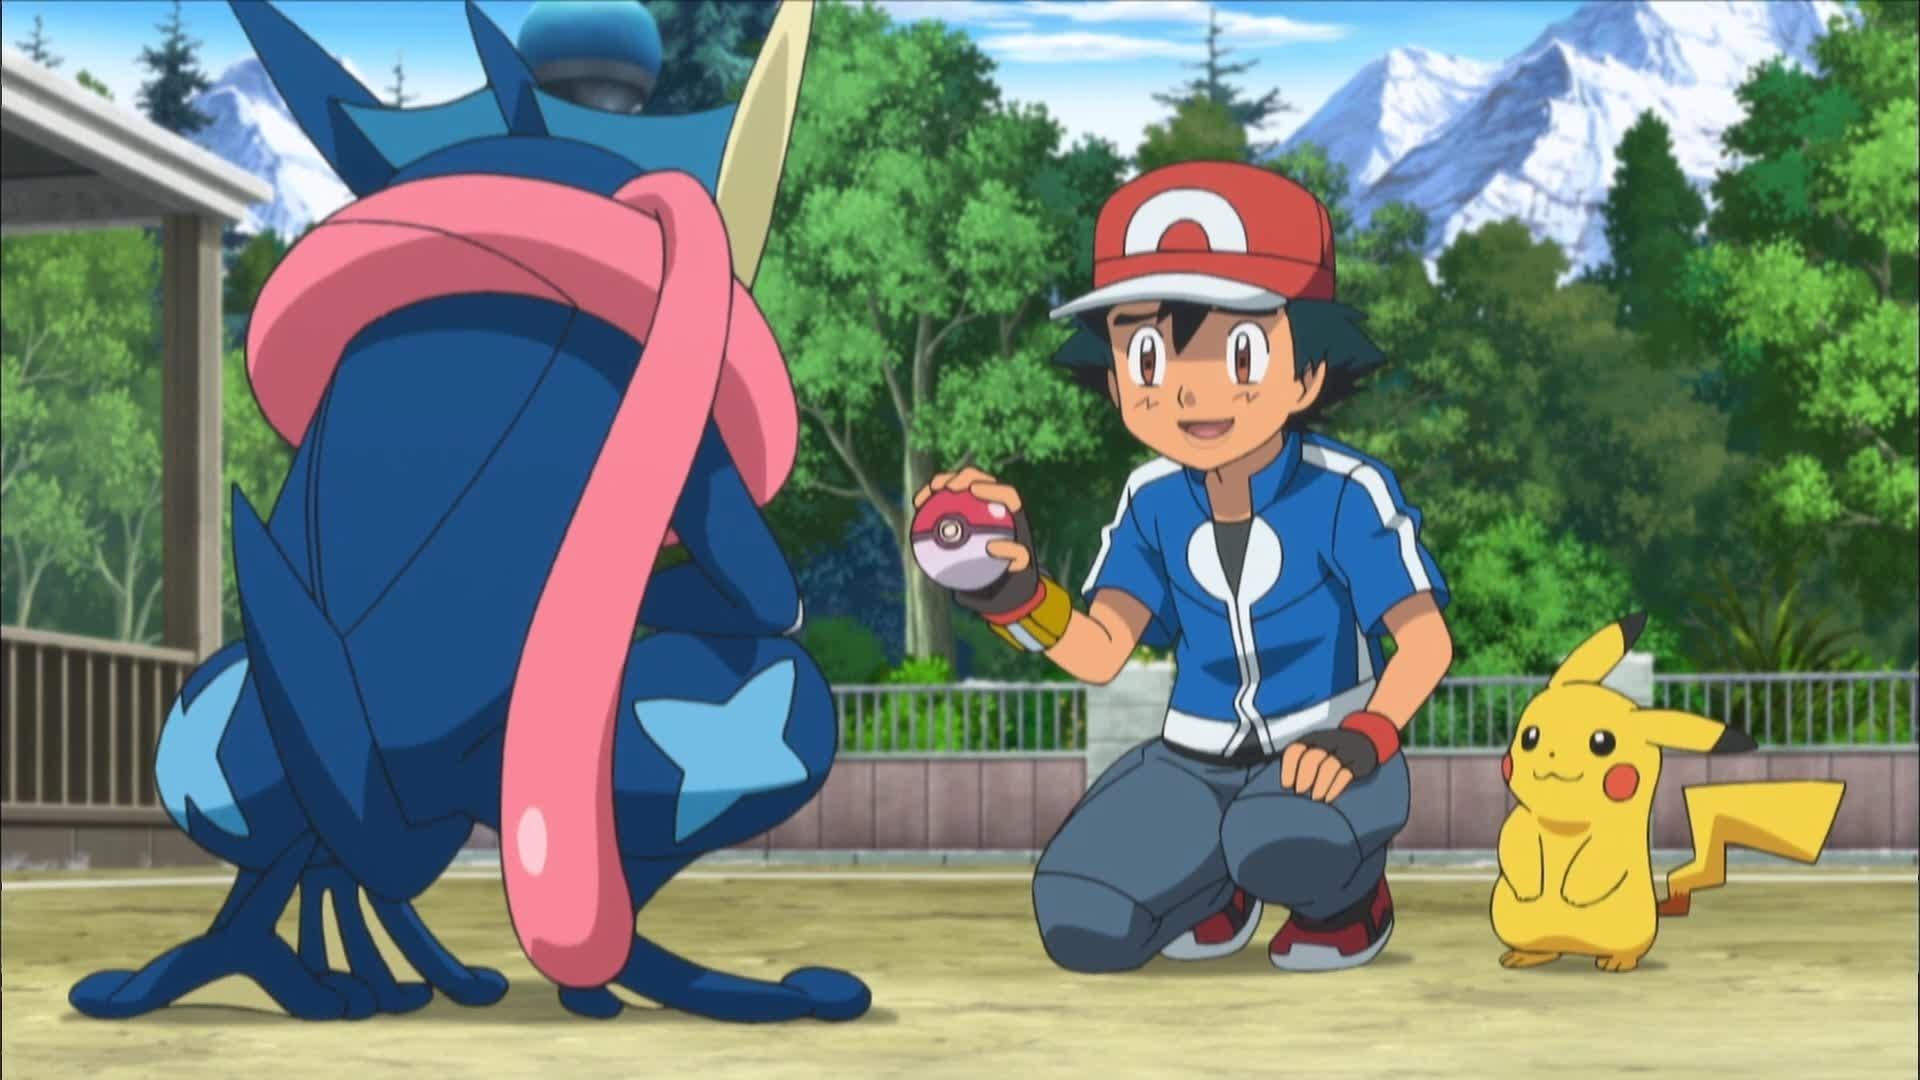 Pokémon - Aflevering 26 - Seizoen 19